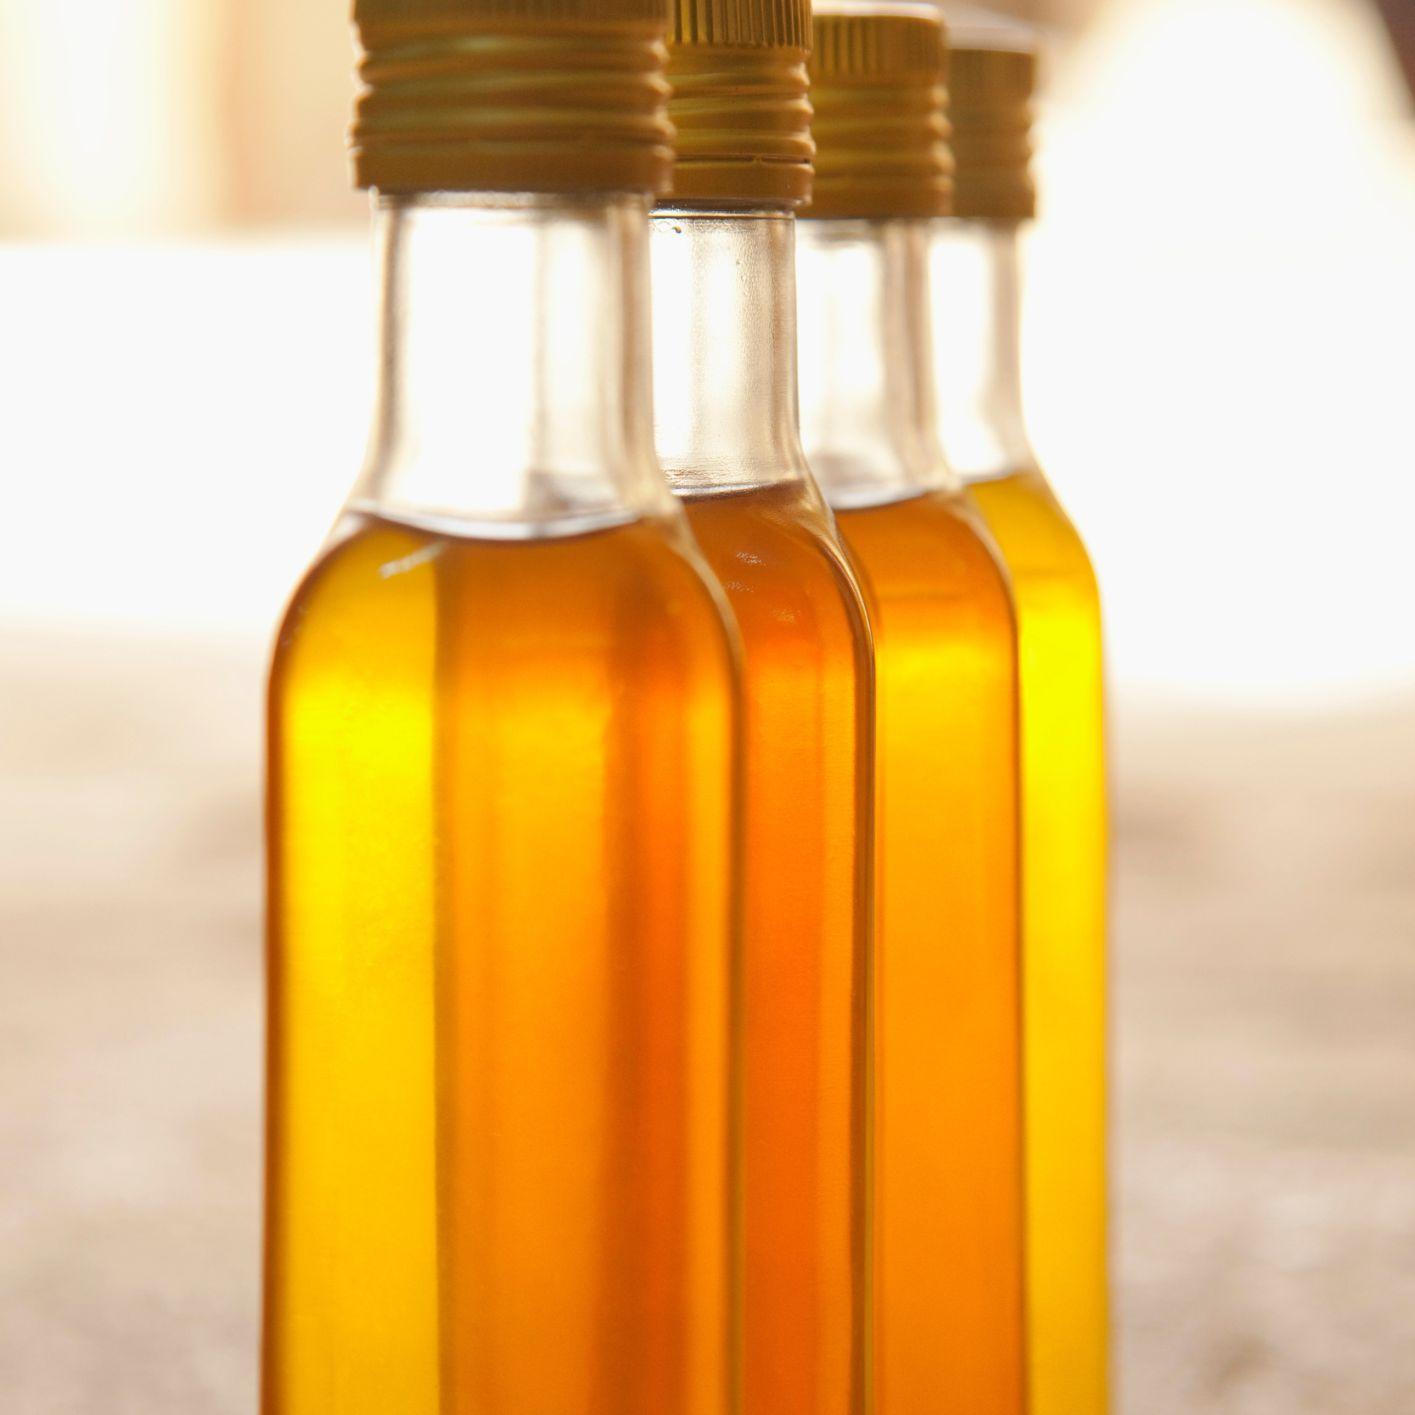 Bottles of Palm Oil for Sale